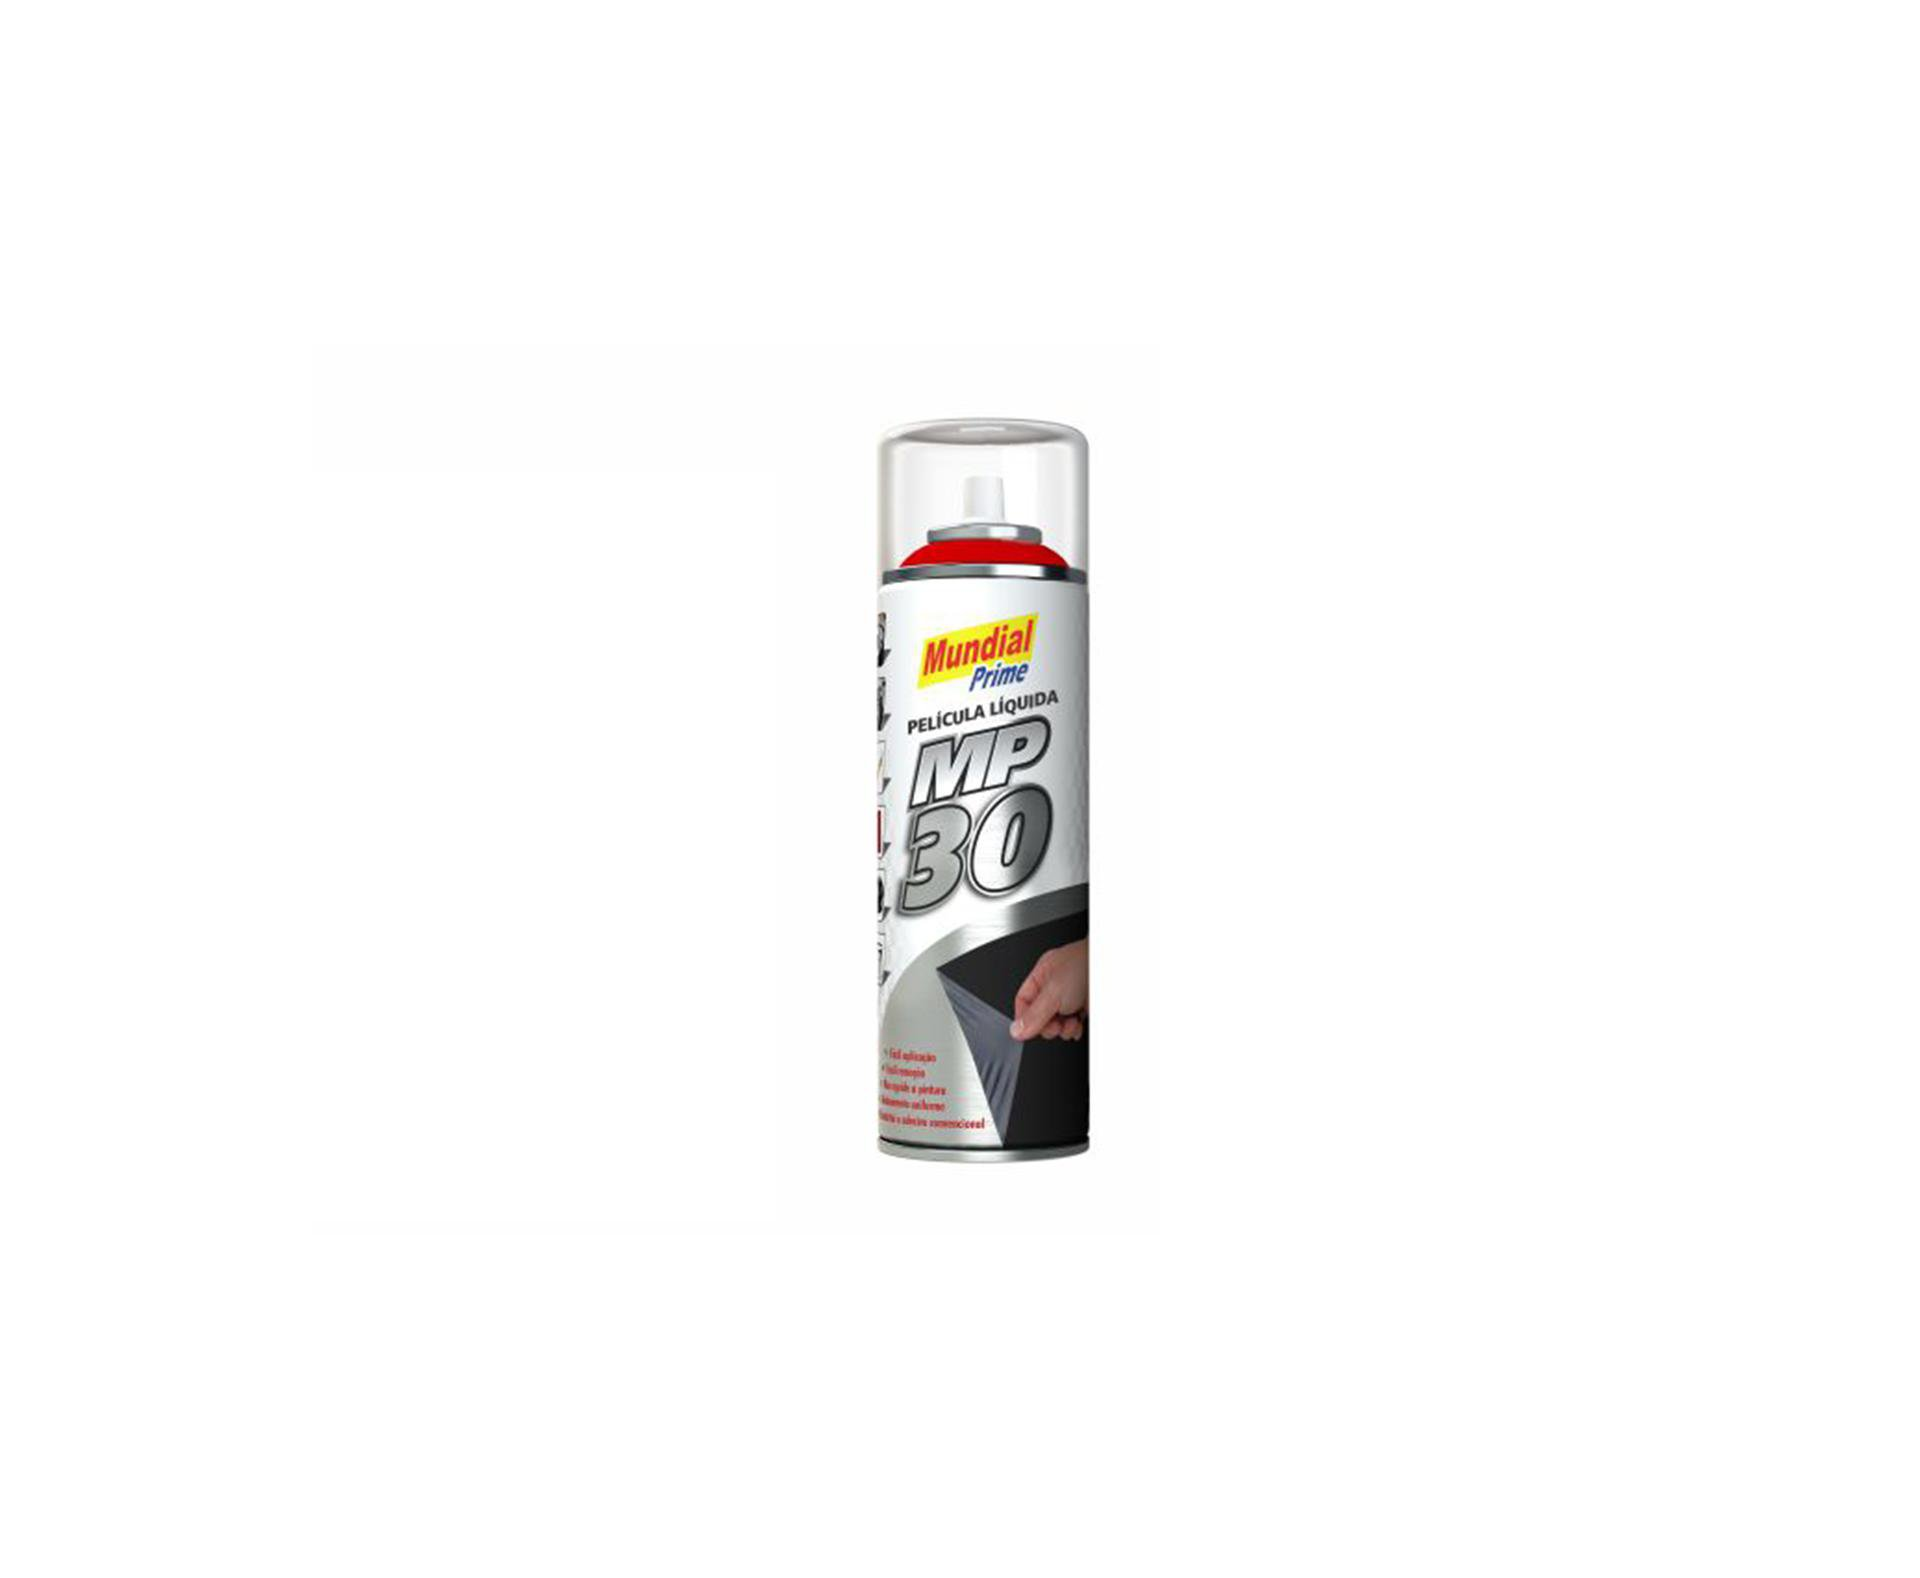 Tinta/película Liquida Mp30 500ml Spray Ug Preto - Mundial Prime